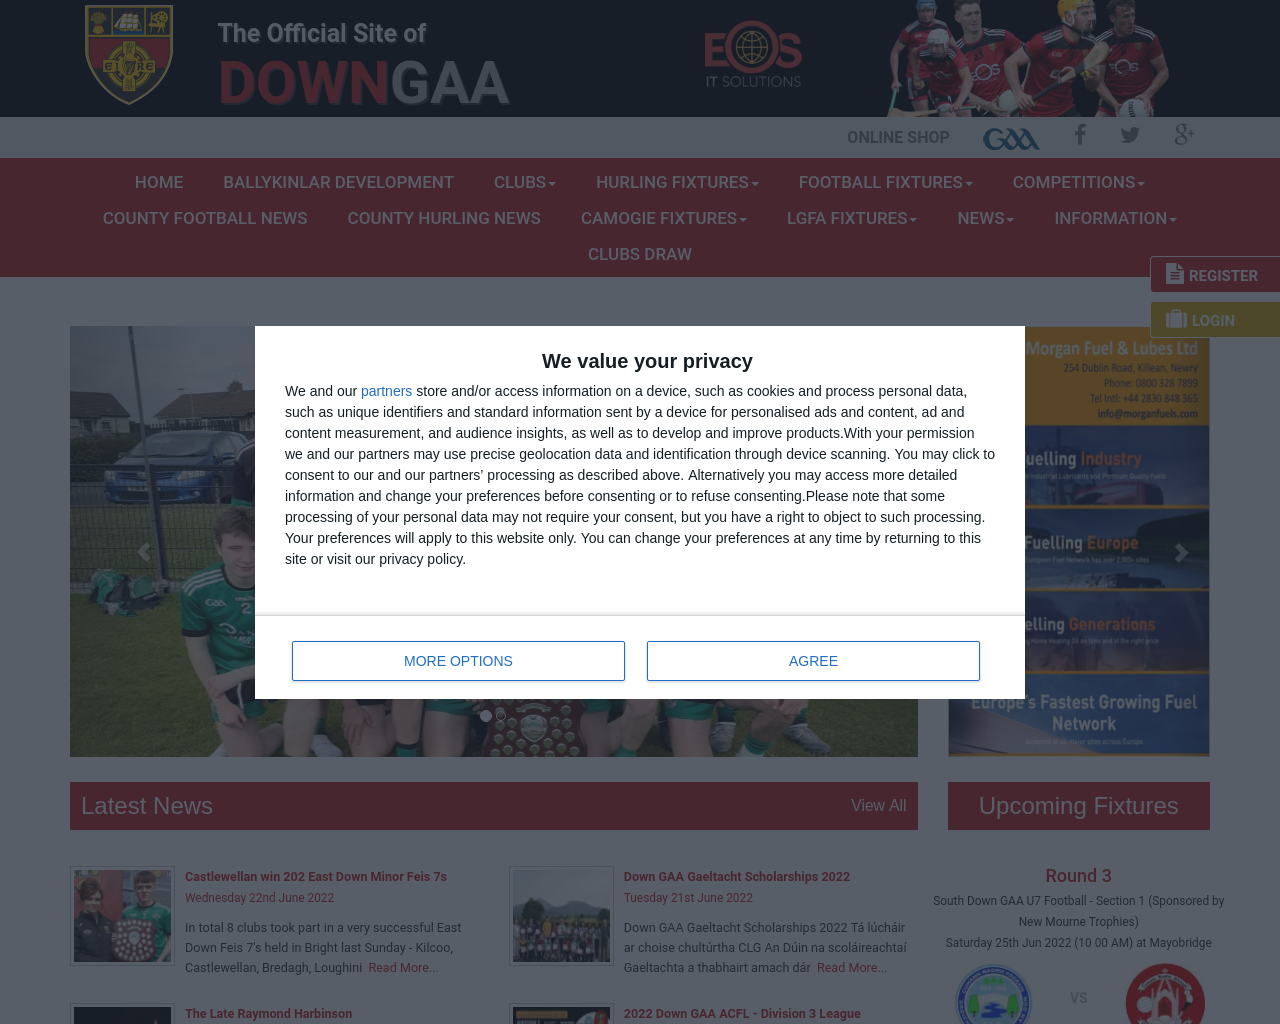 Down GAA